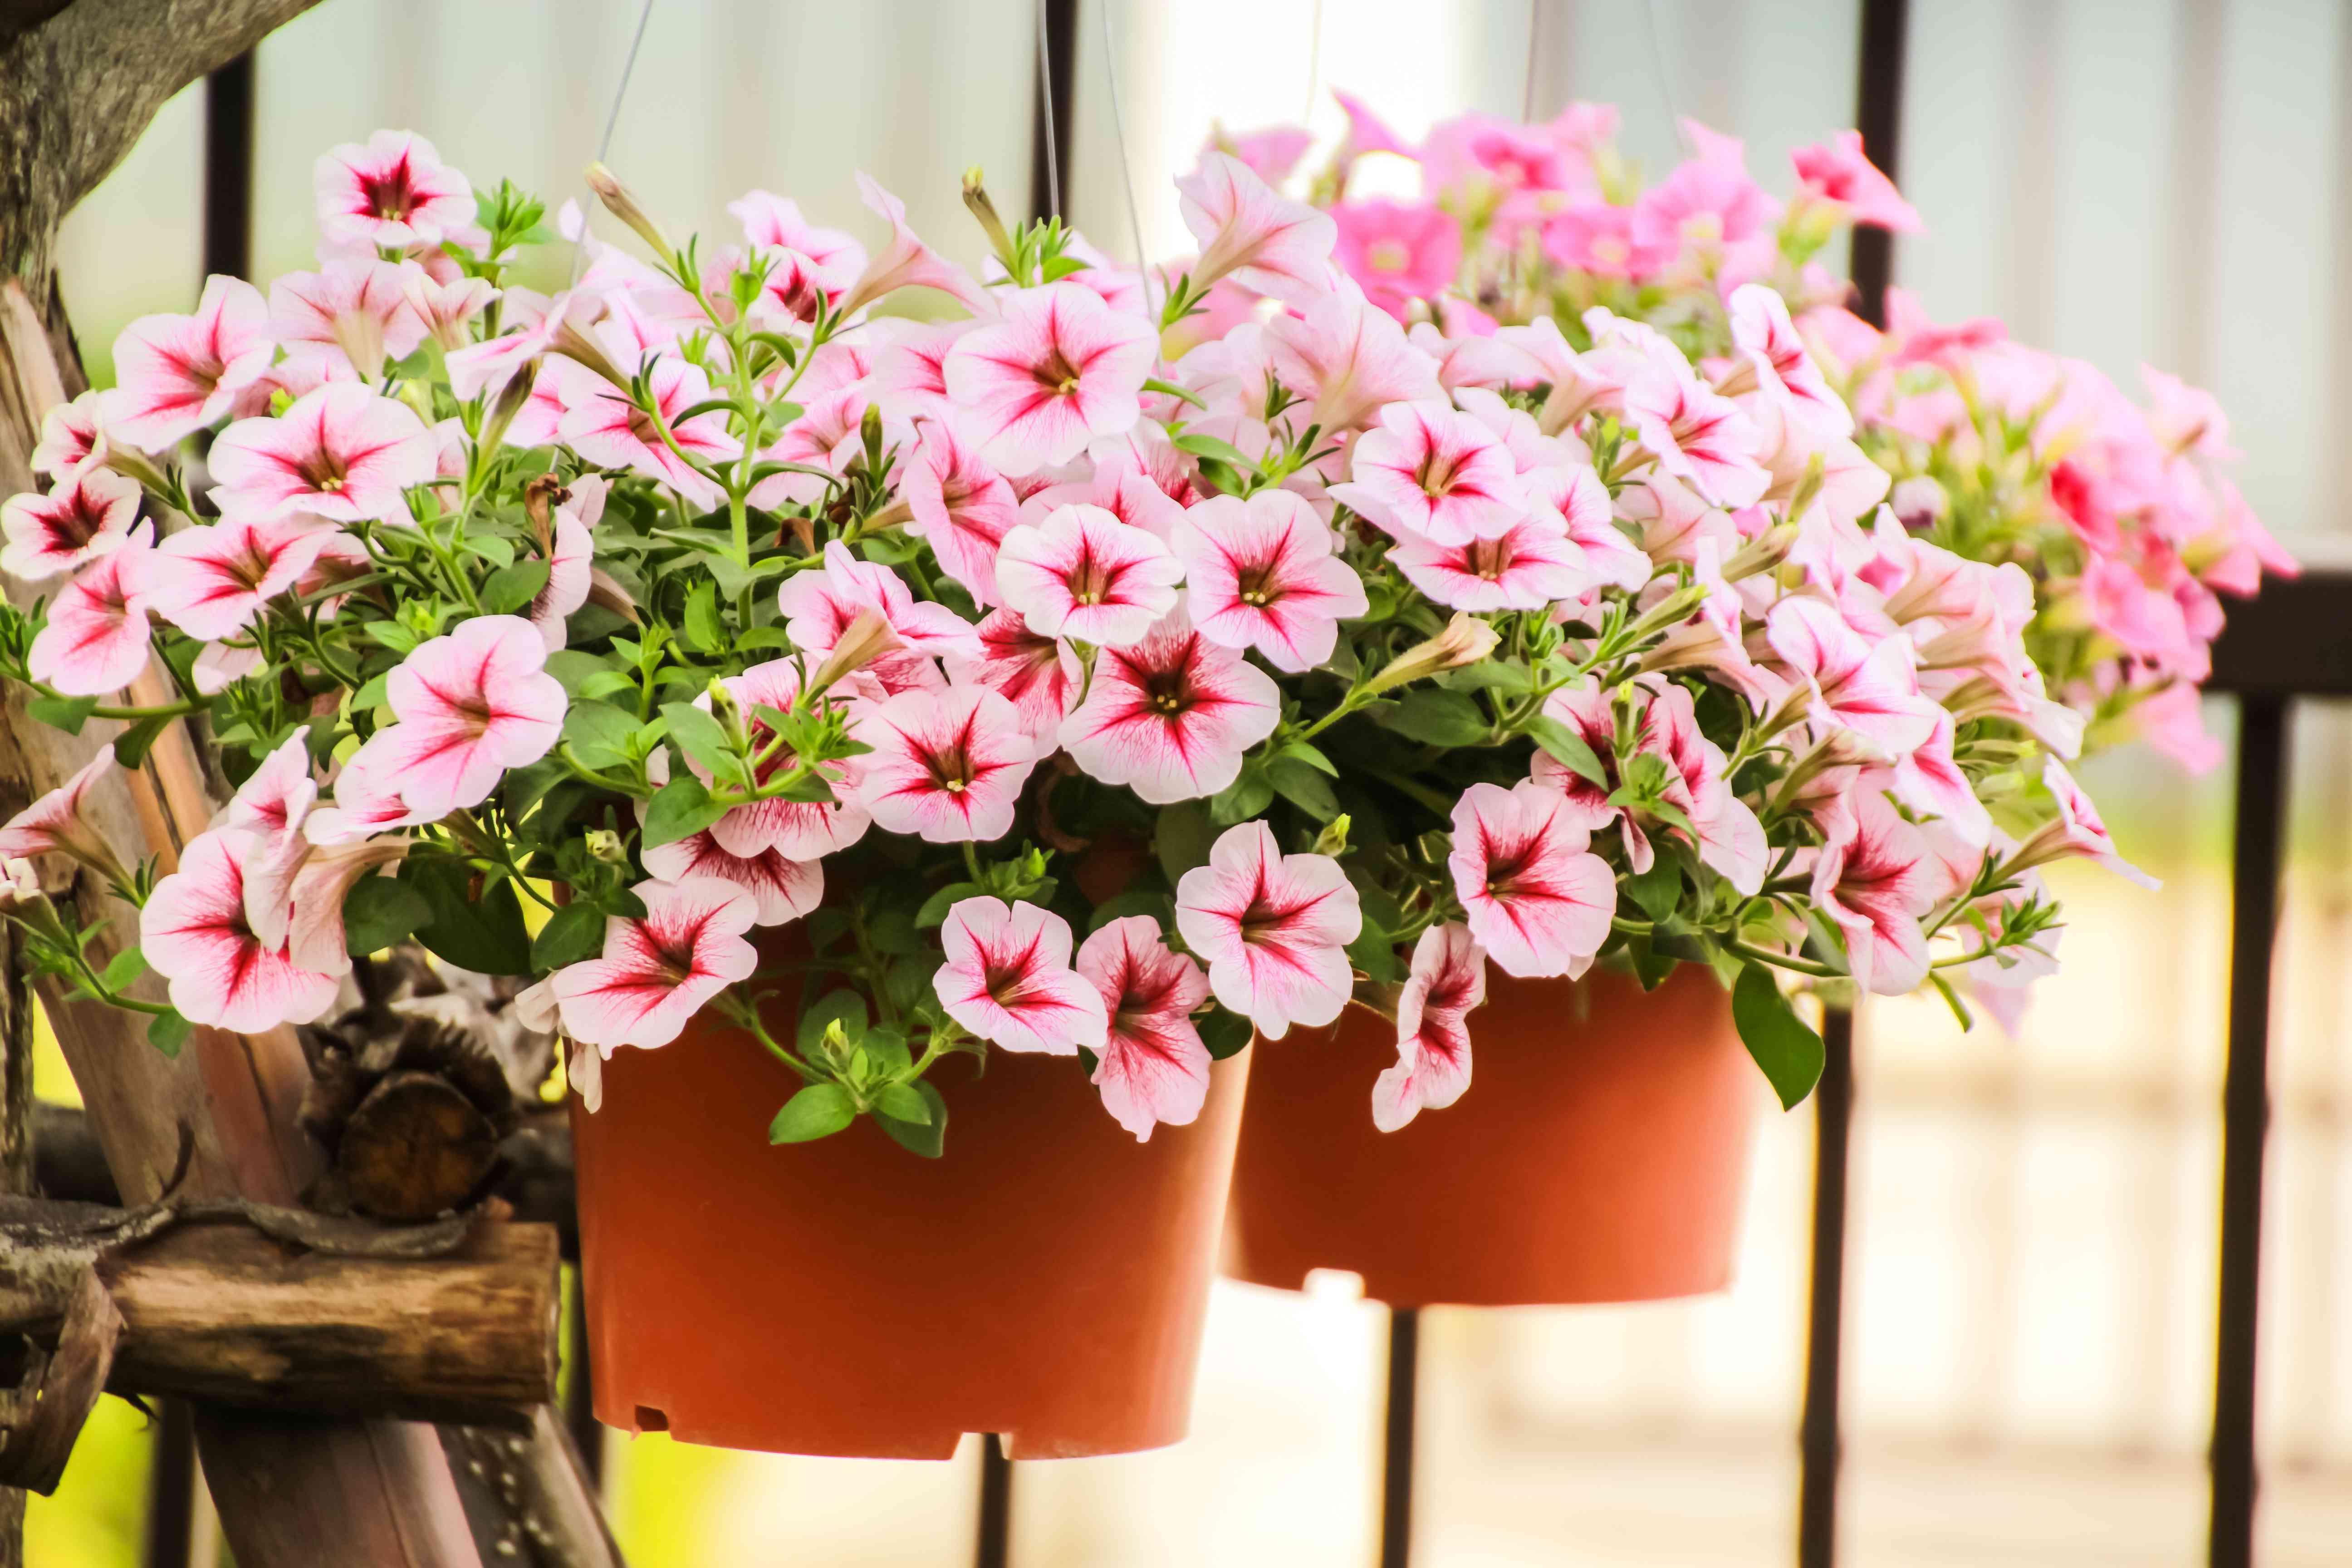 Closed up Petunia flower, pink petunia flower